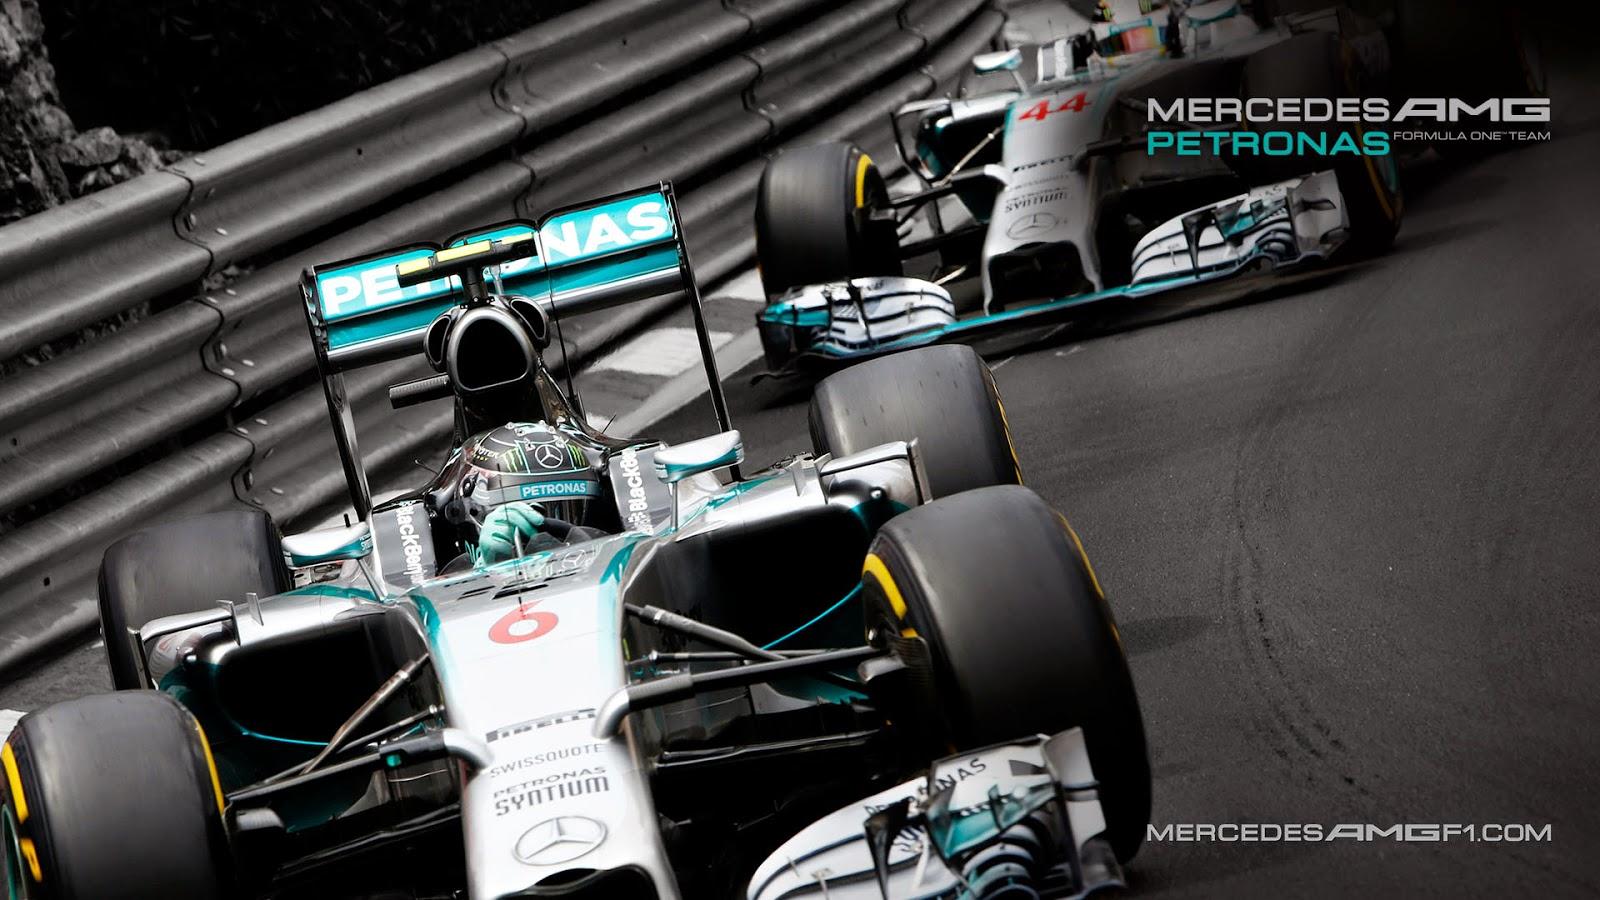 Mercedes AMG Petronas W05 2014 F1 Wallpaper | KFZoom